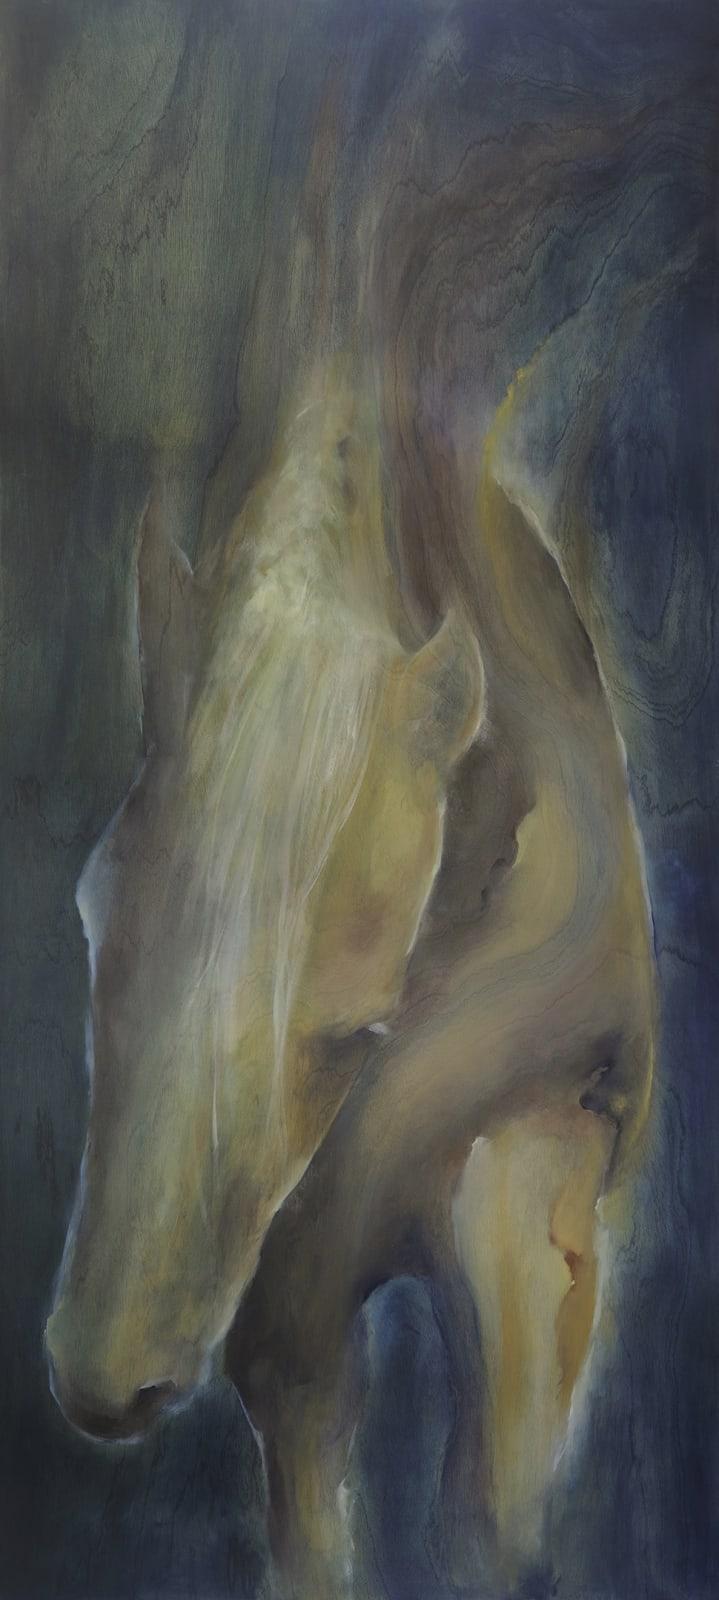 Nicholas Baldridge 'Strength' Oil on Wood, 34 x 80